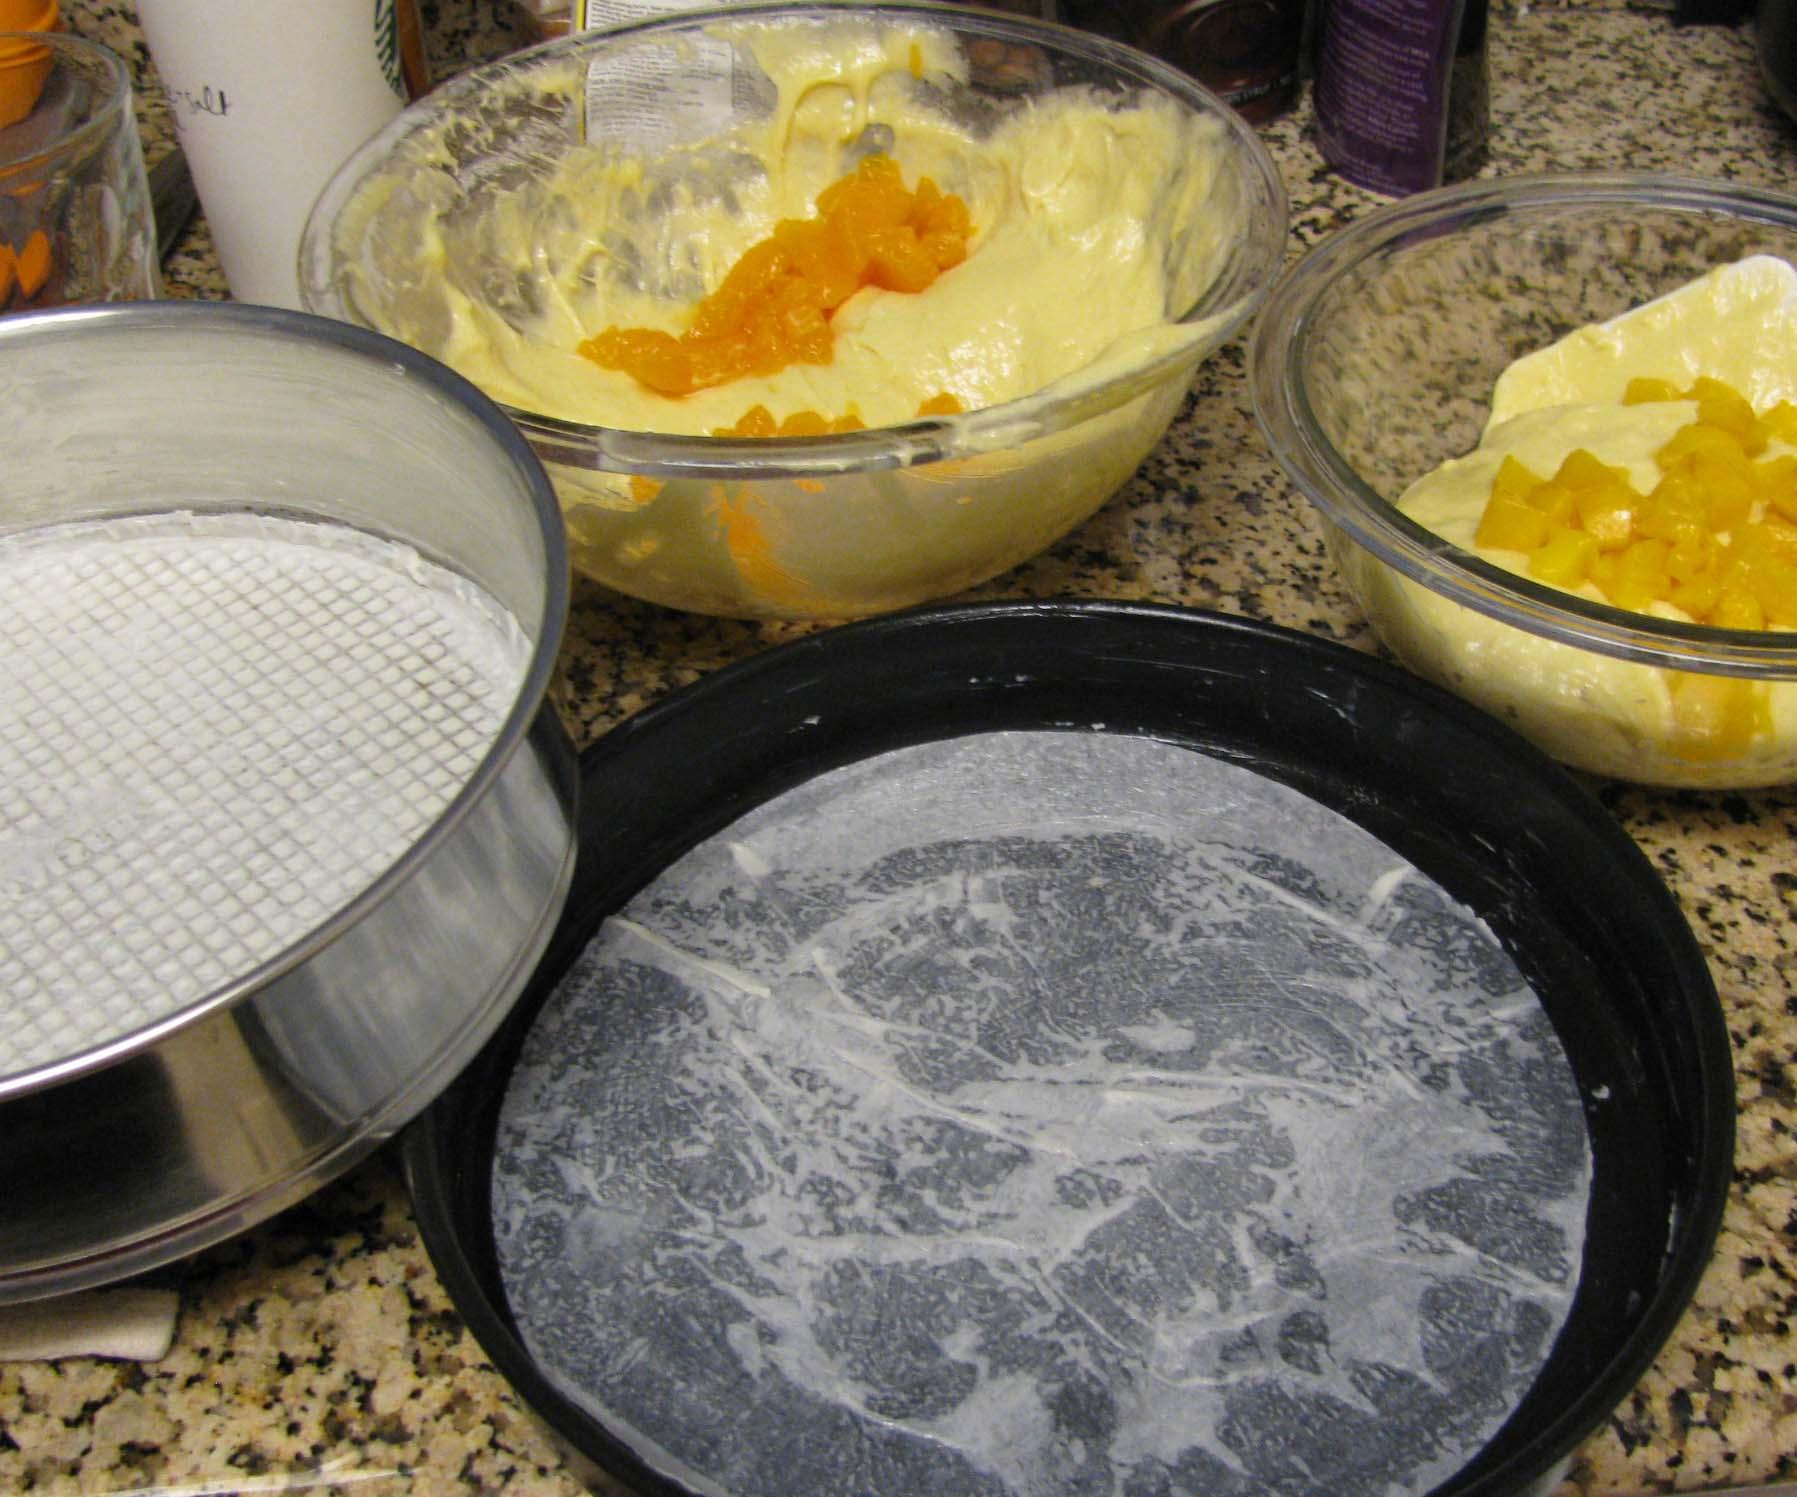 juicy satsuma orange cake via juicy satsuma orange cake winter citrus ...